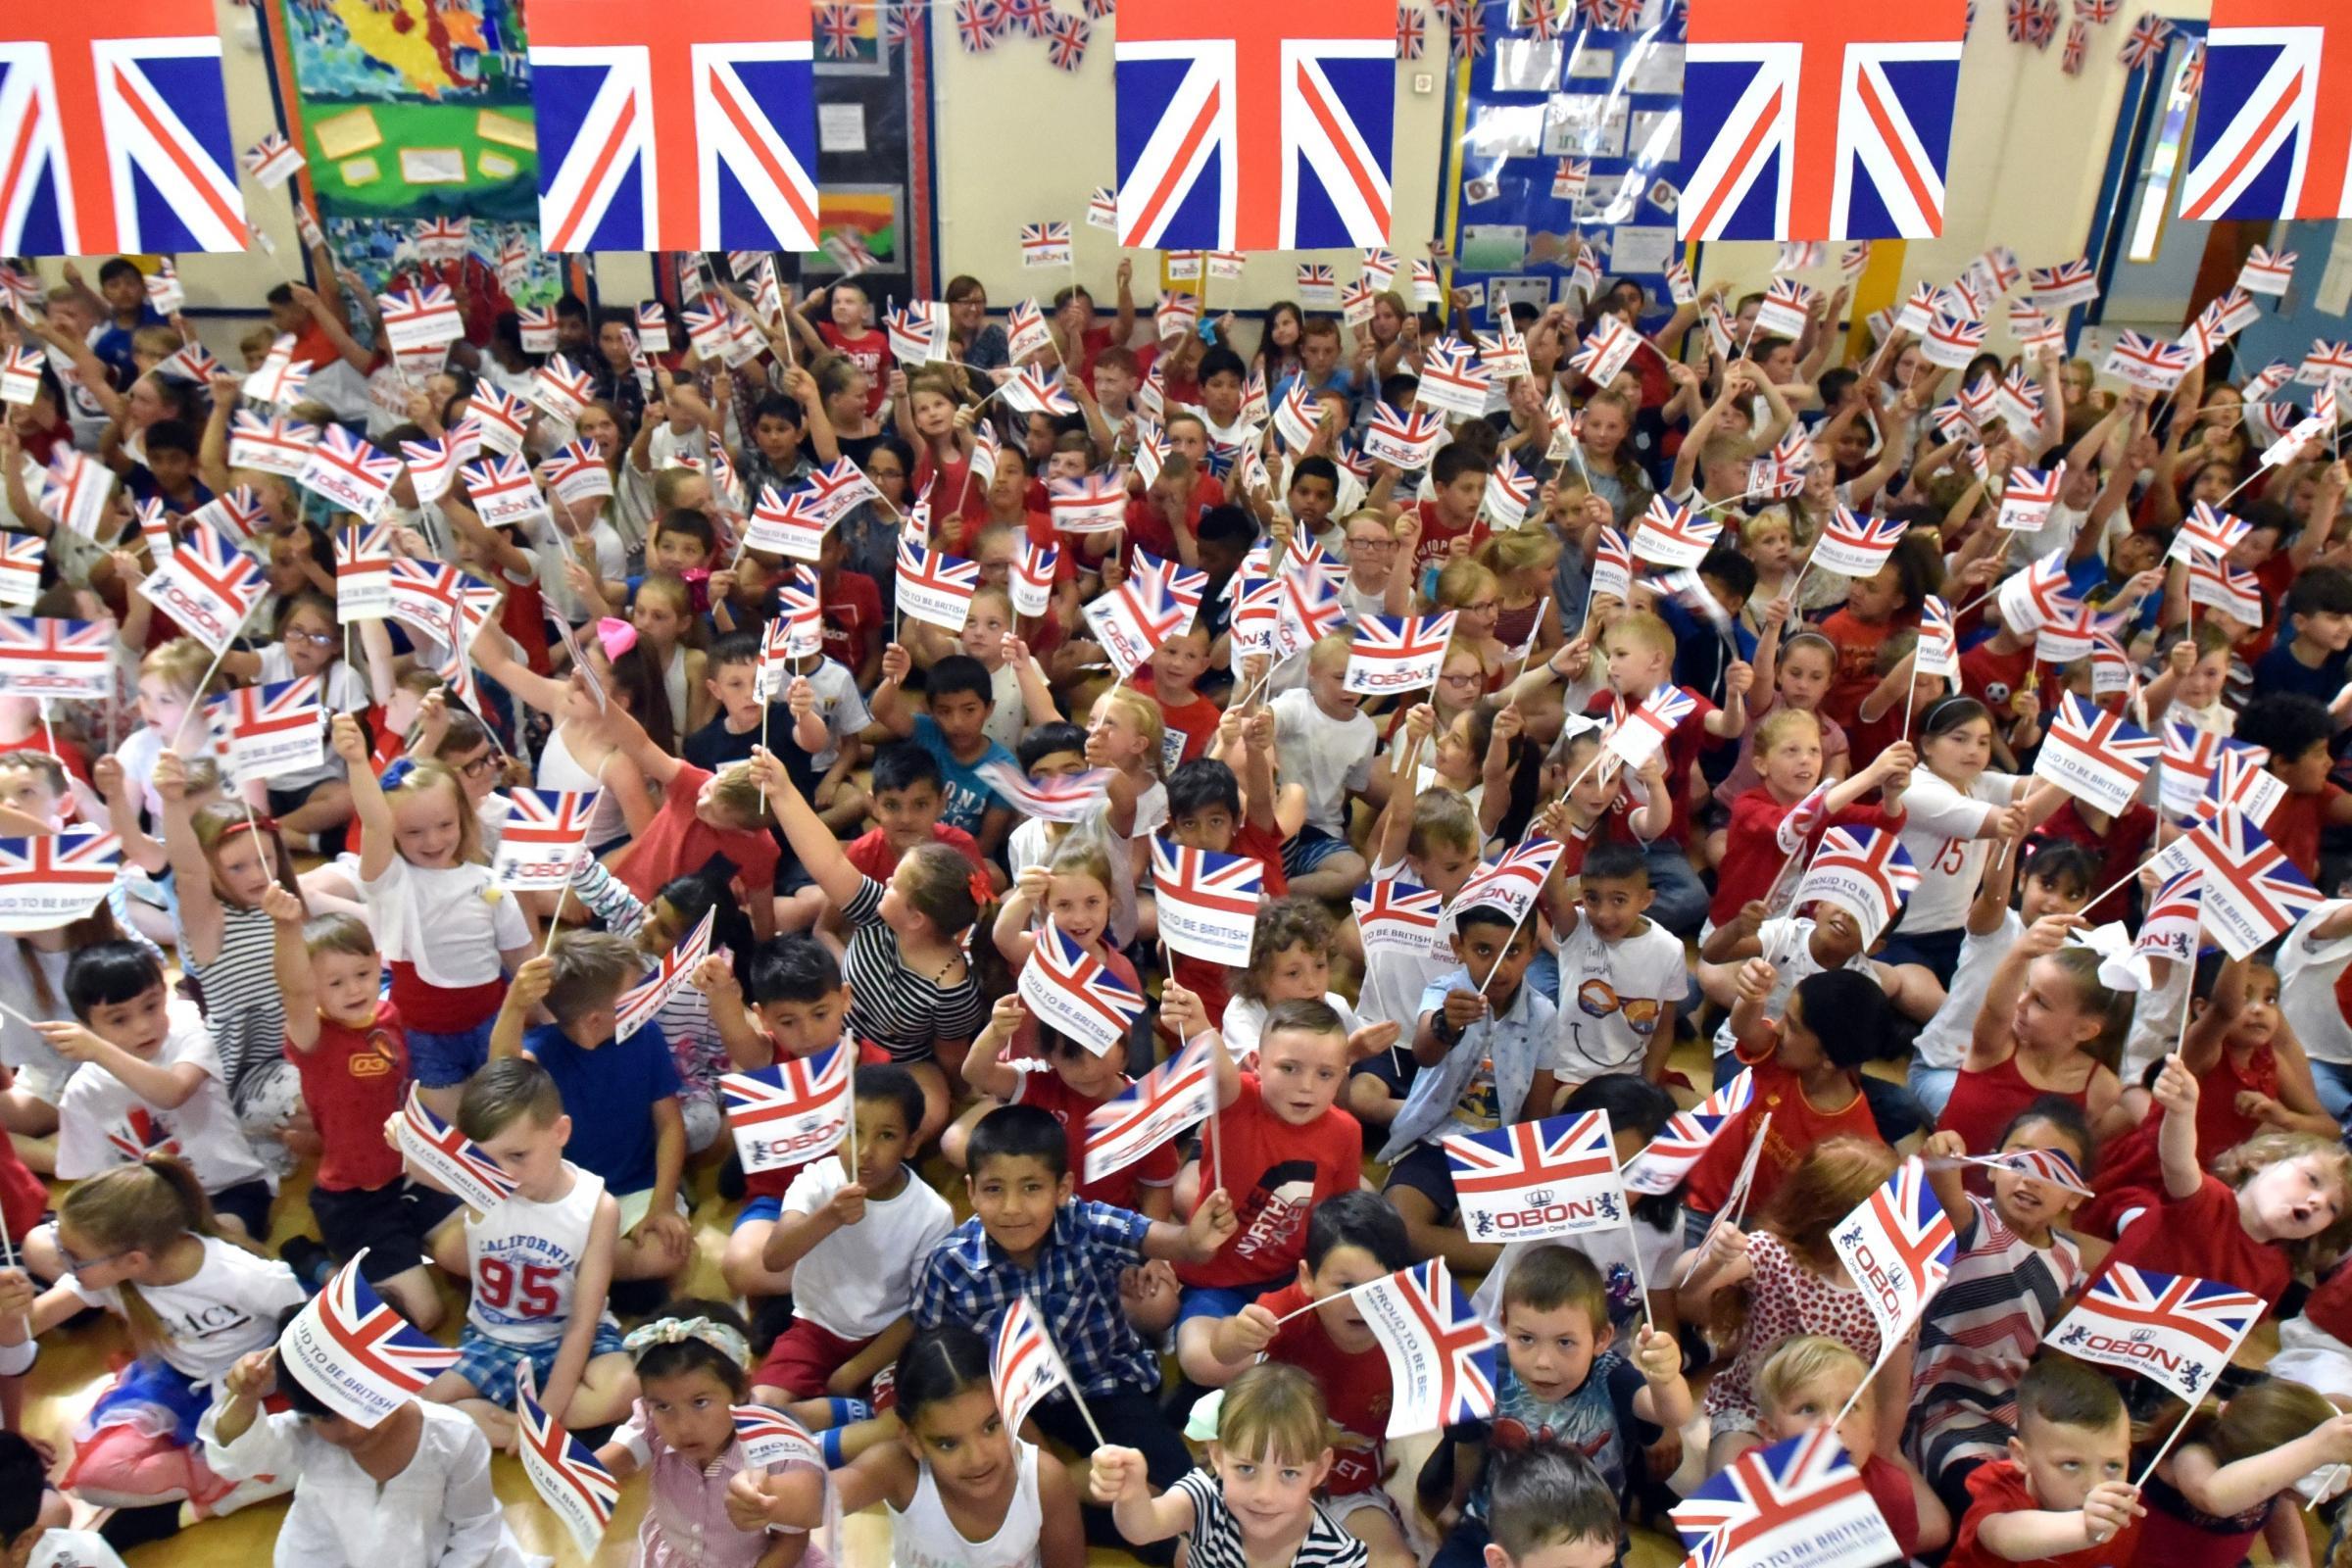 OBON One Britain, One Nation, One Nonsense